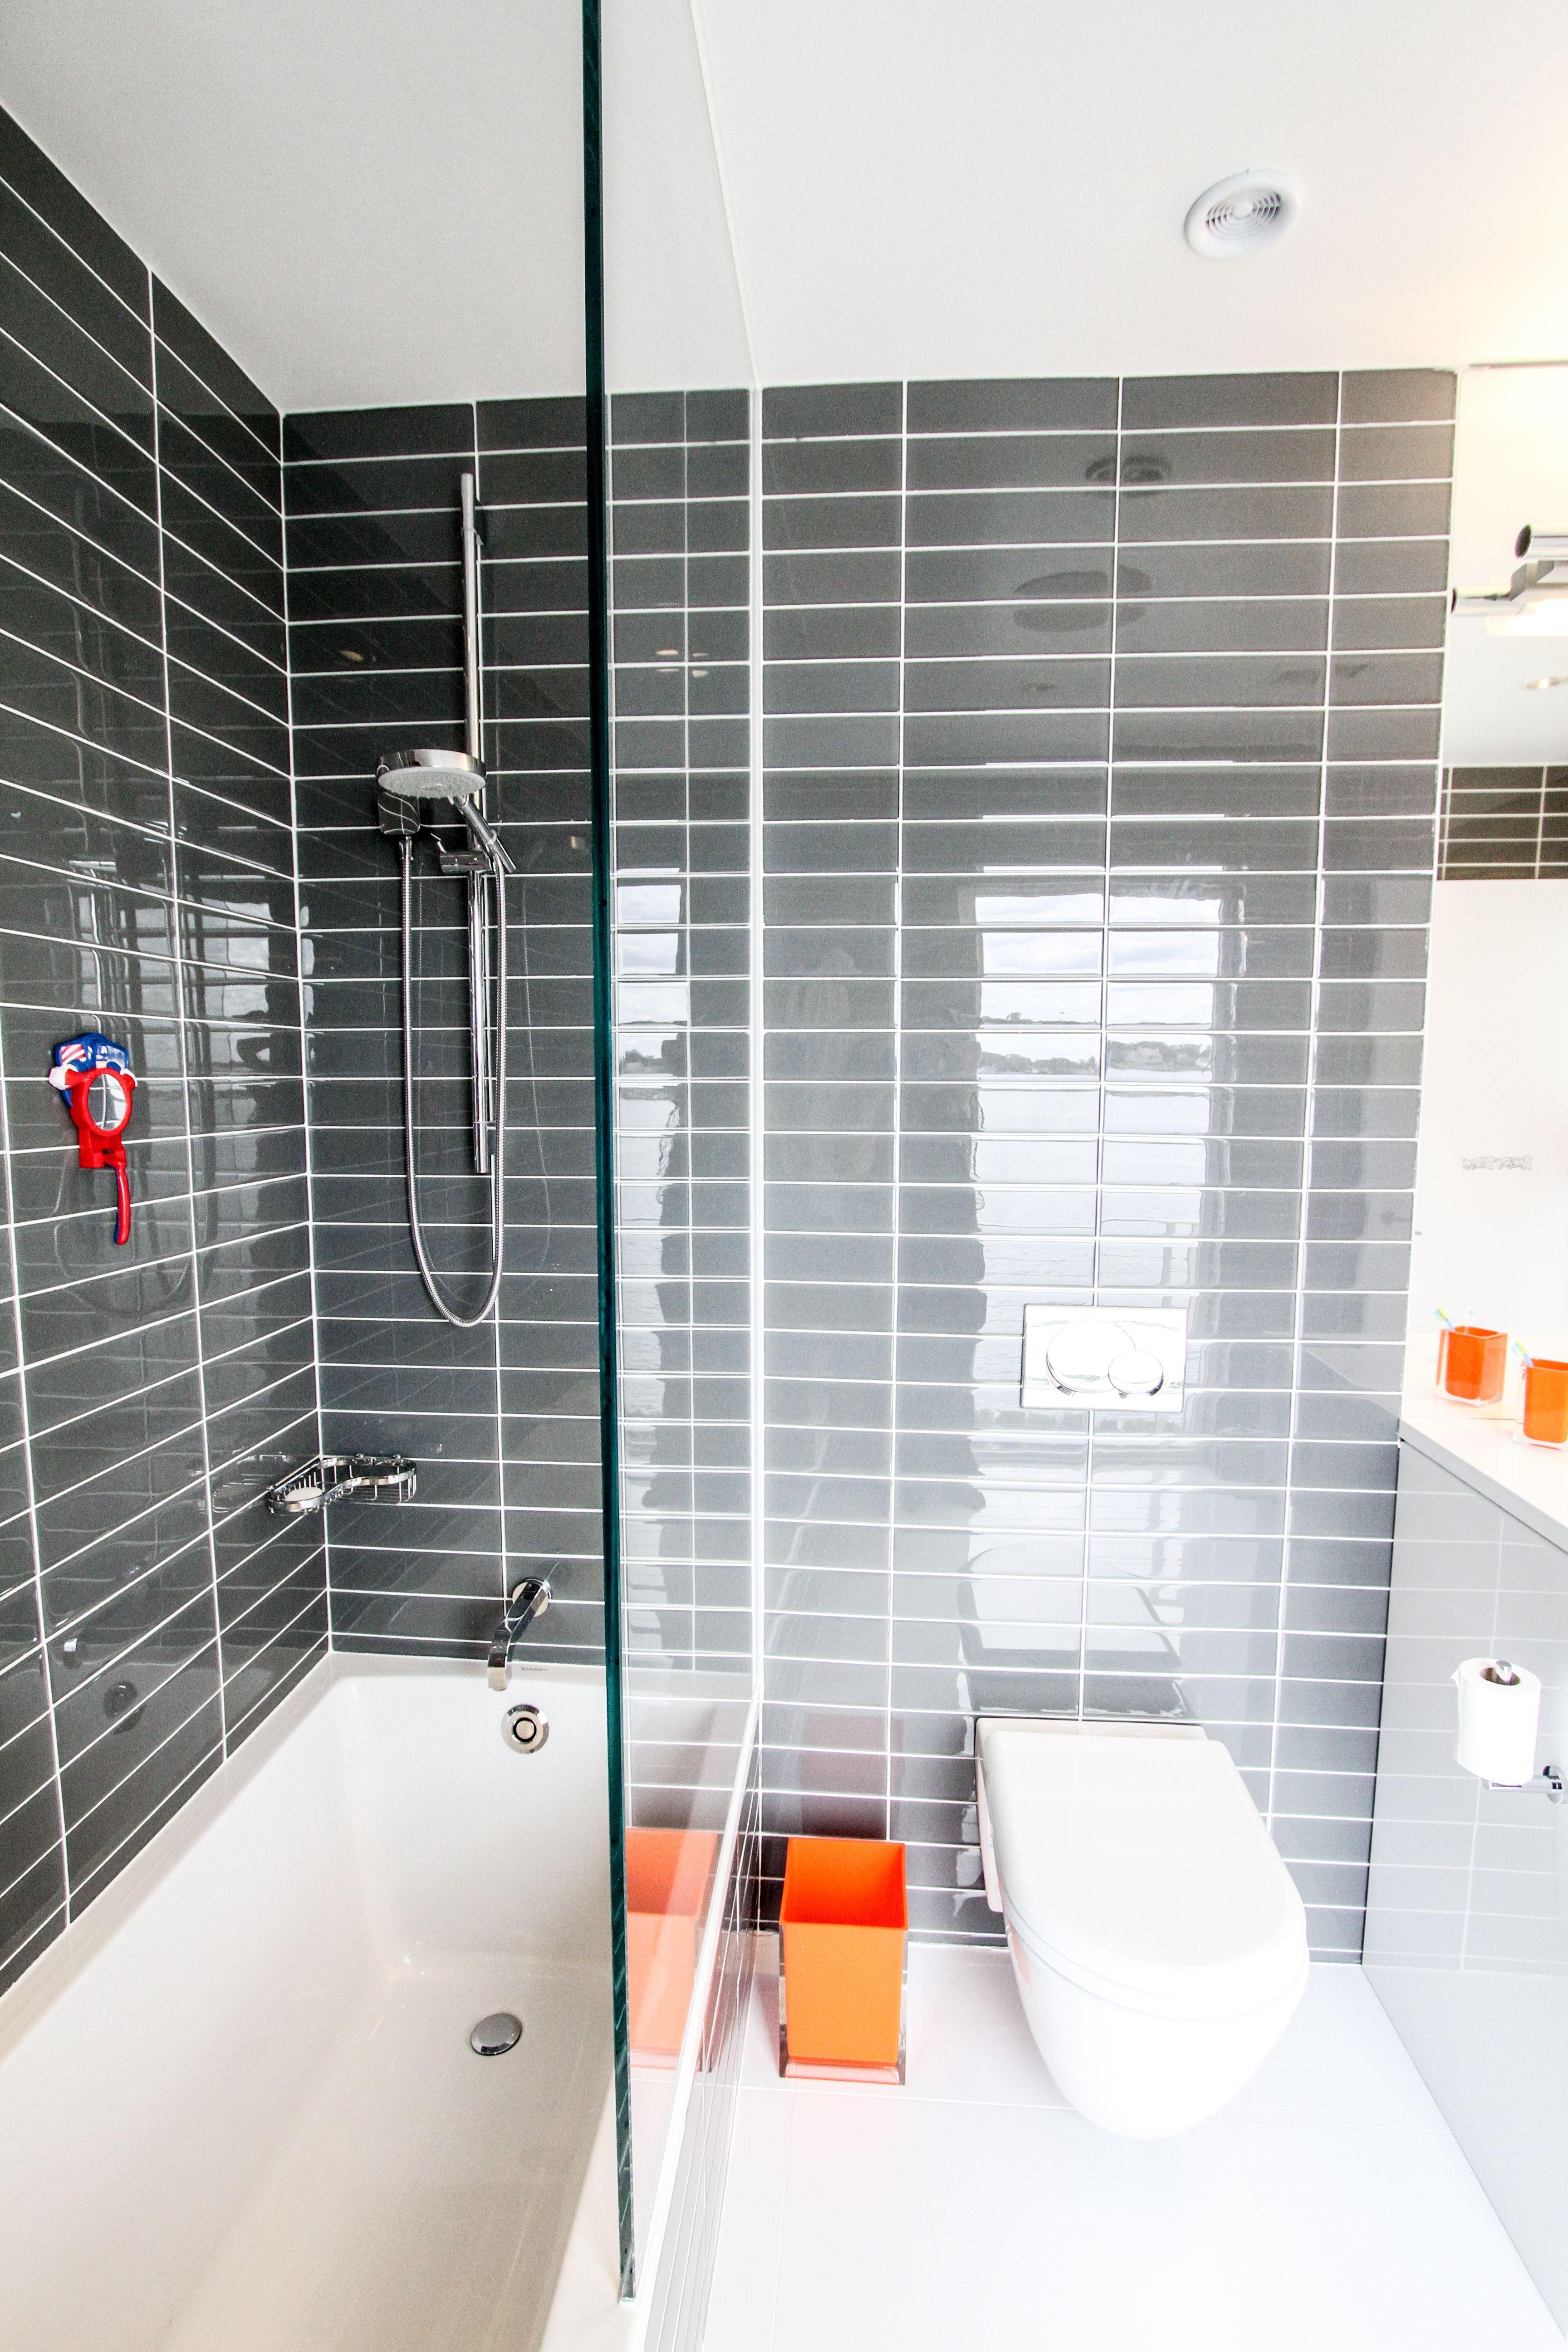 Bathroomdesignshowroomslongisland Bathroom Inspiration Modern Zen Bathroom Design Japanese Bathroom Design Bathroom renovation danbury ct